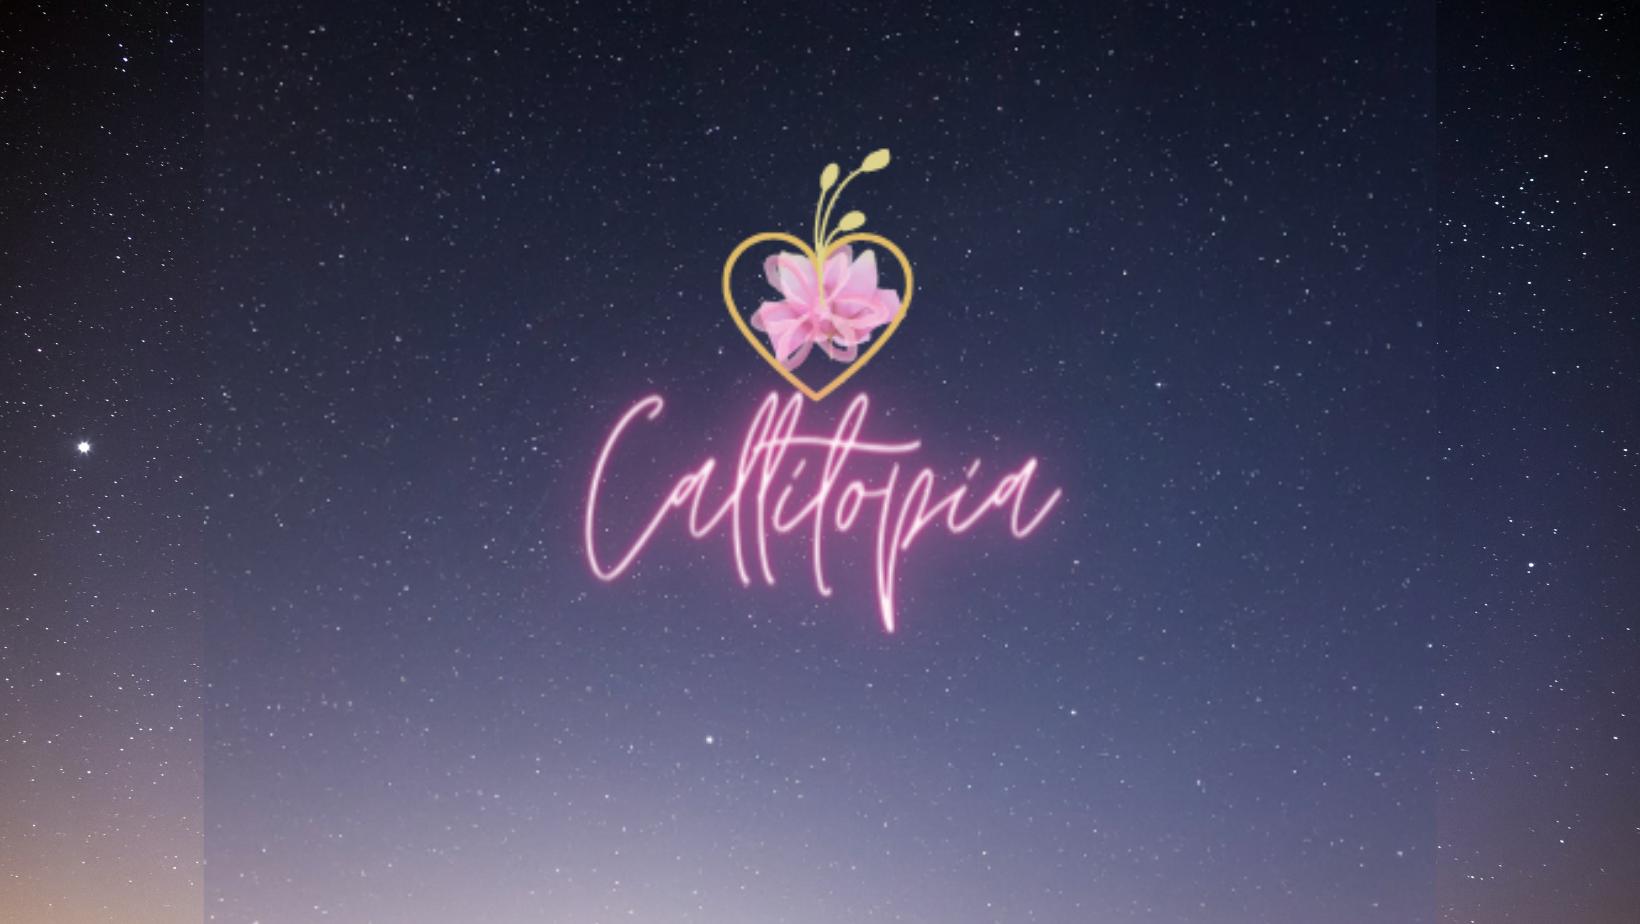 callitopia neon pink script